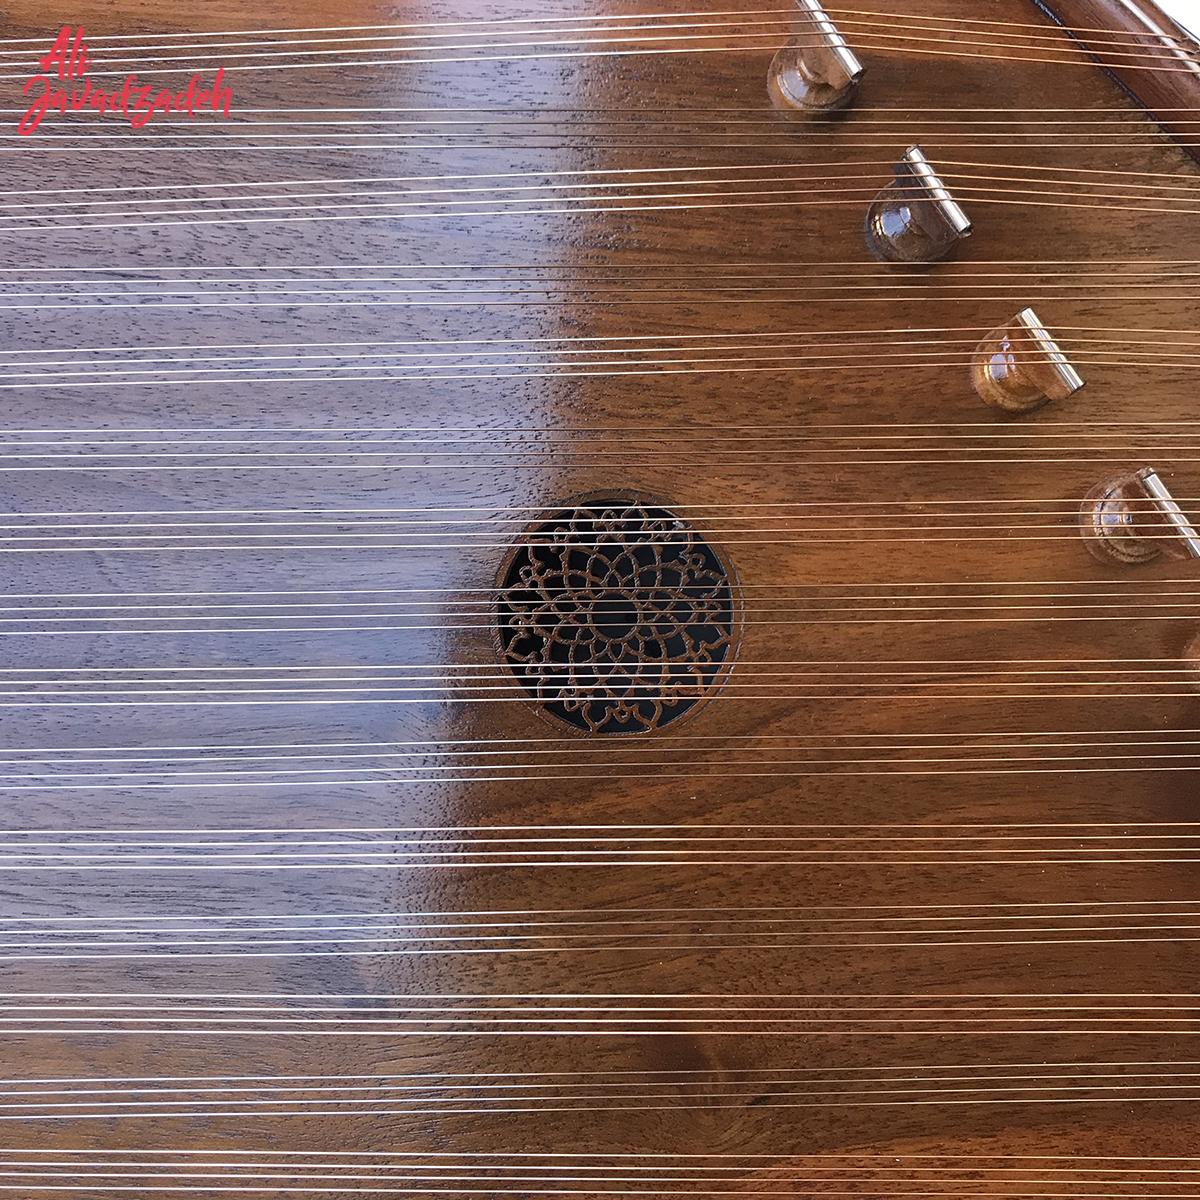 سنتور احد مسعودی مدل سه مهر ویژه پلاک چکاوک